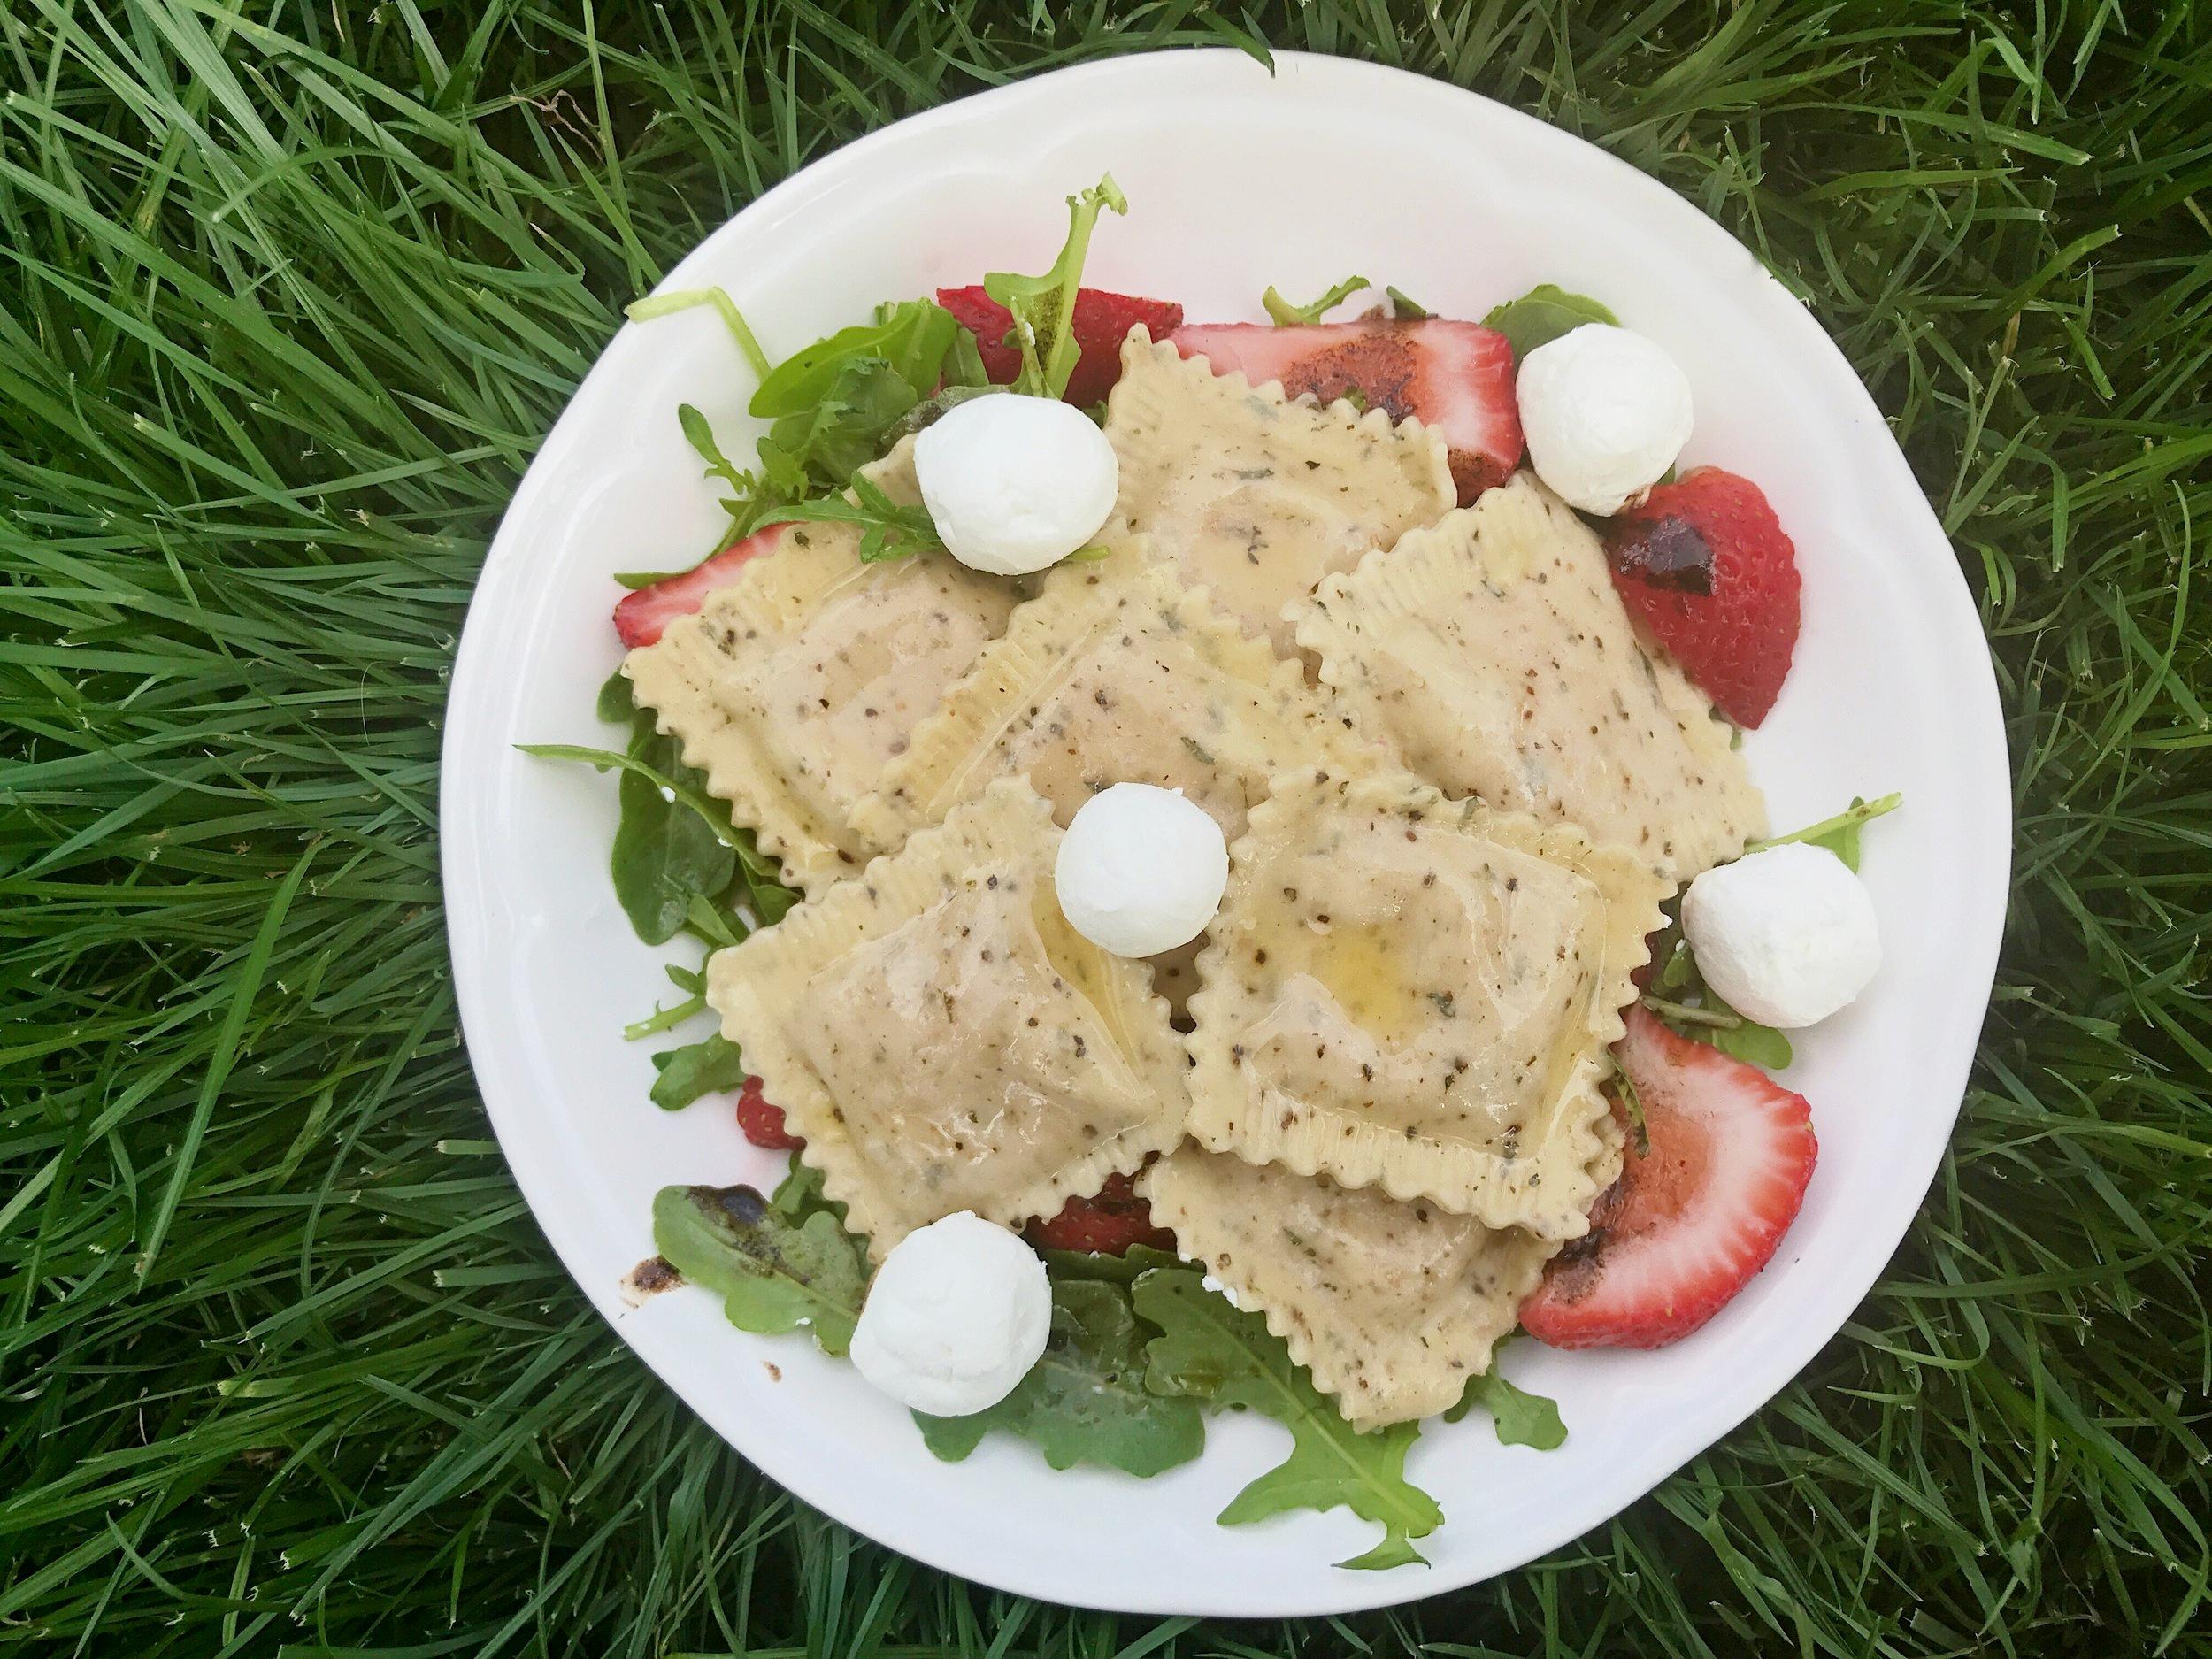 Arugula, Strawberry, & Chevre Salad w/ Balsamic Reduction & Lemon Butter  (feat. Strawberry Chevre w/ Lemon, Thyme, & Black Pepper Ravioli)